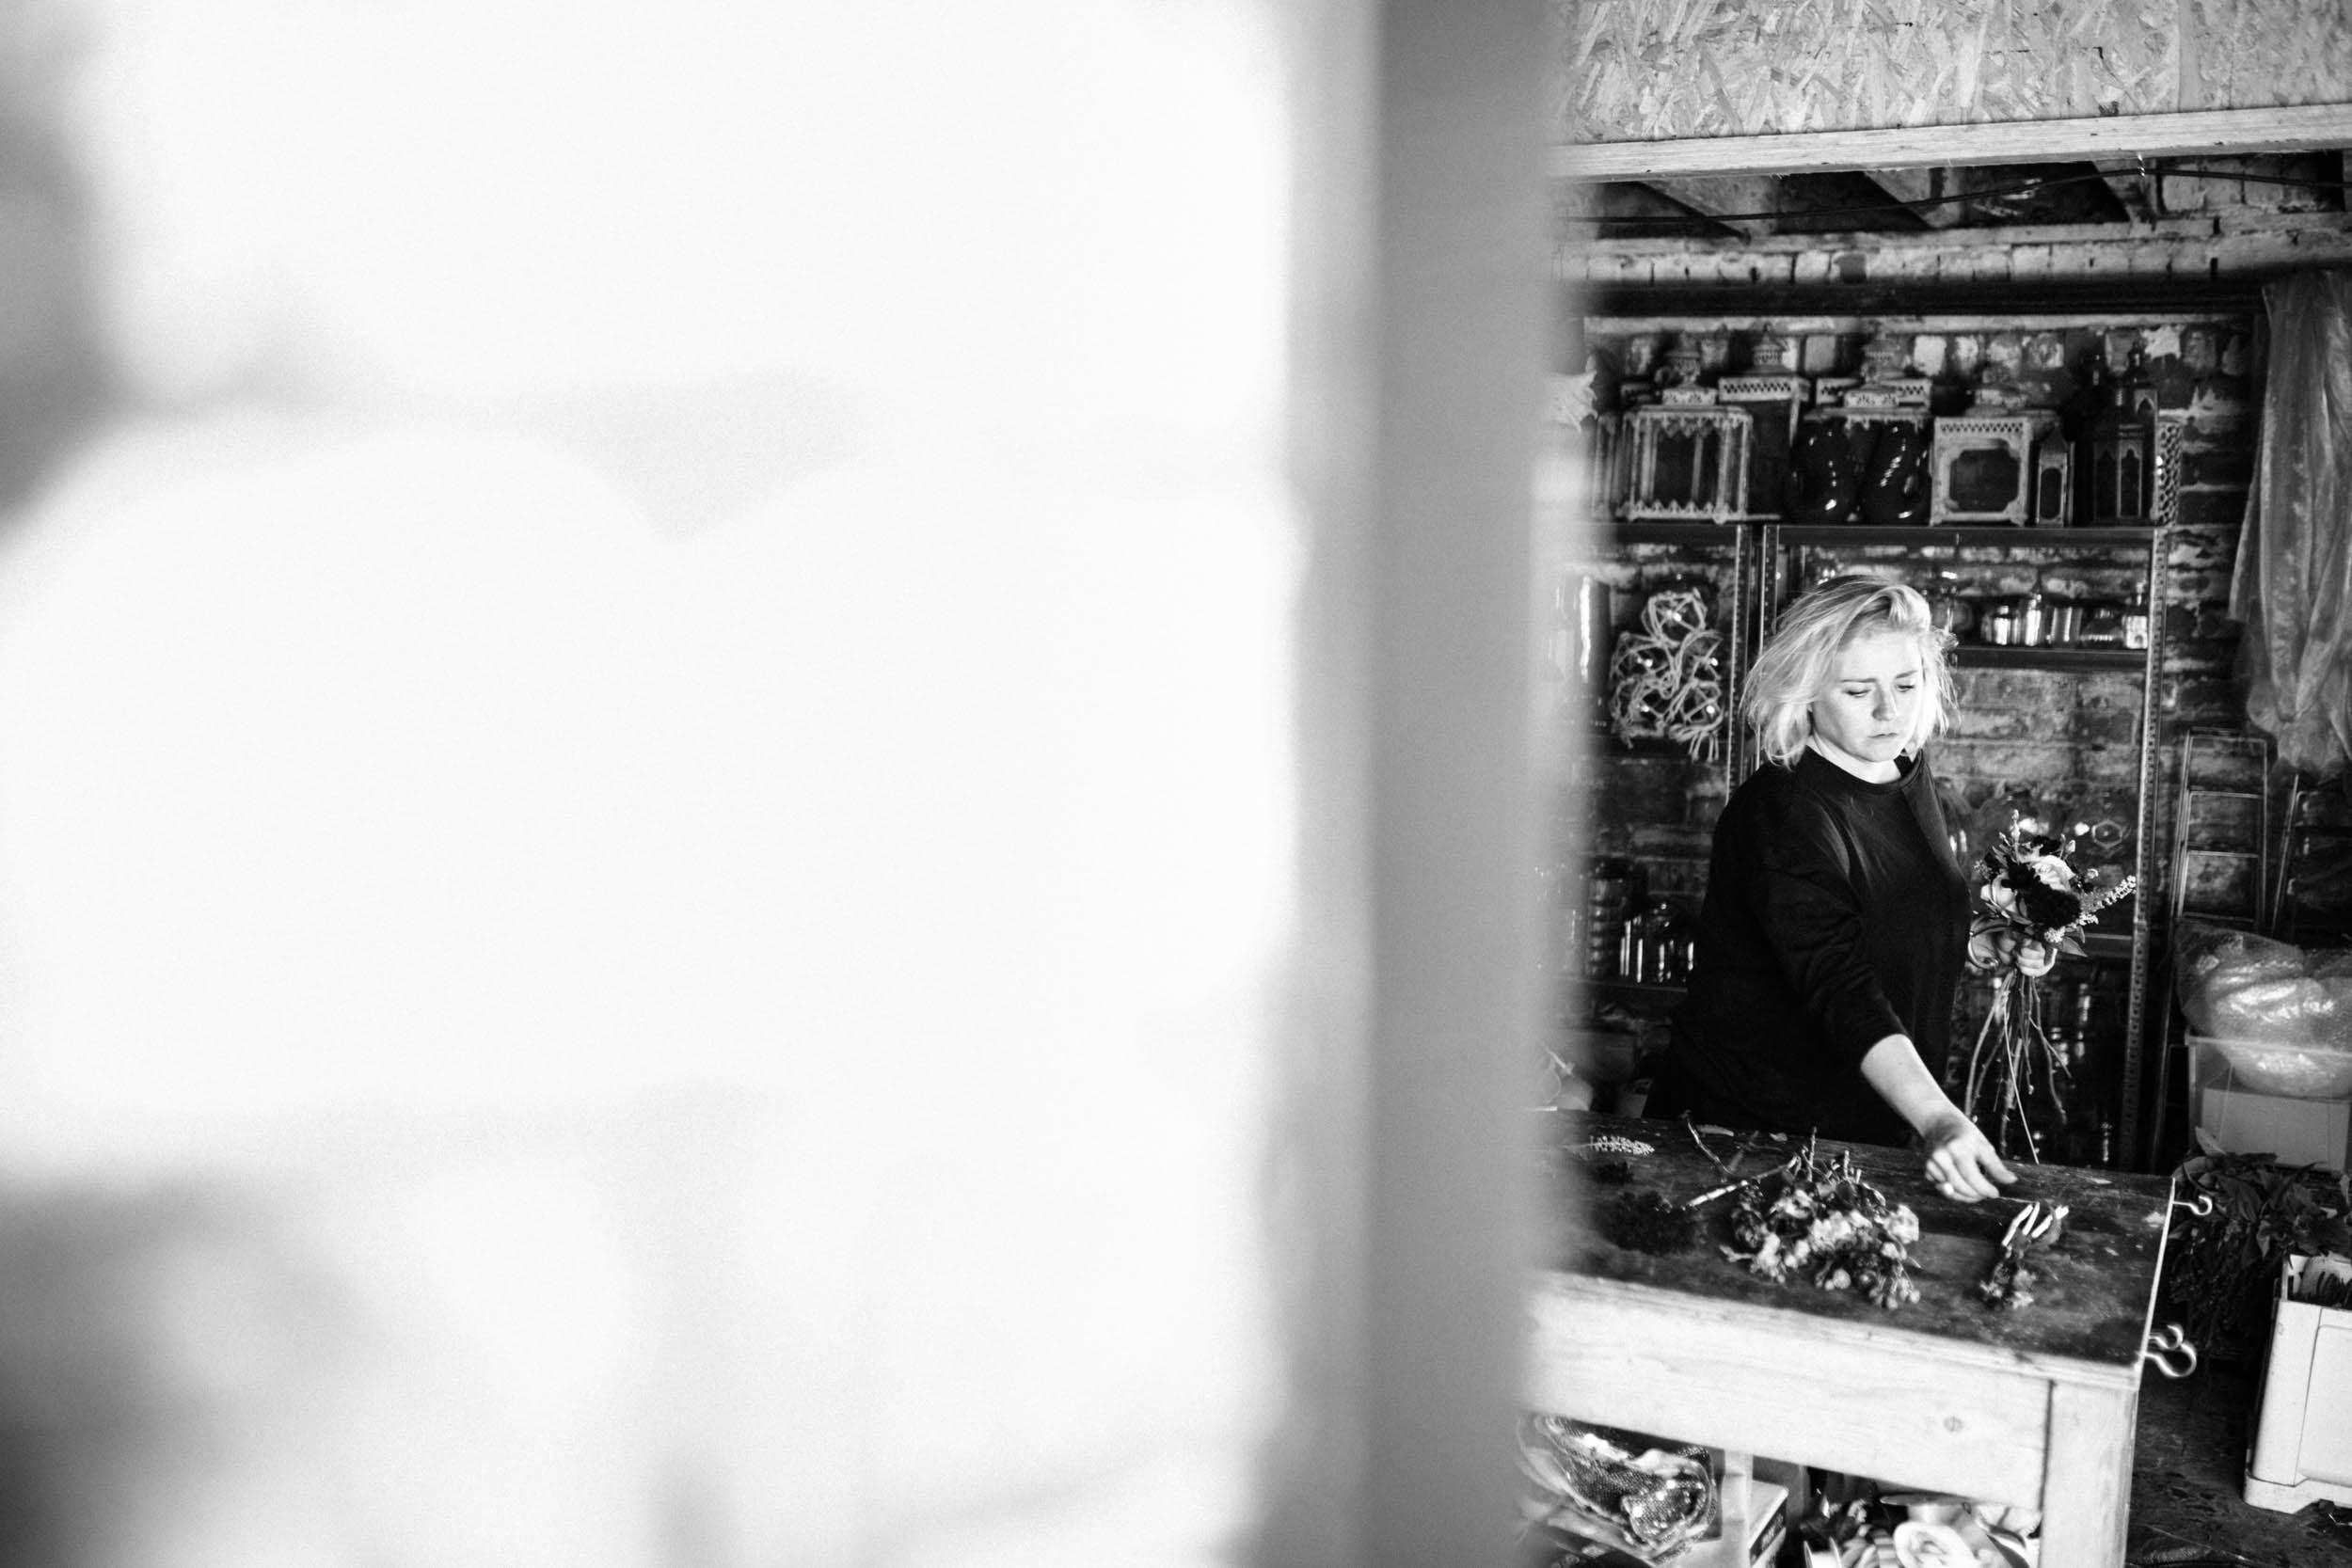 Alex_Sedgmond_Photography-Forbesfield-Cardiff_SouthWales-28.jpg